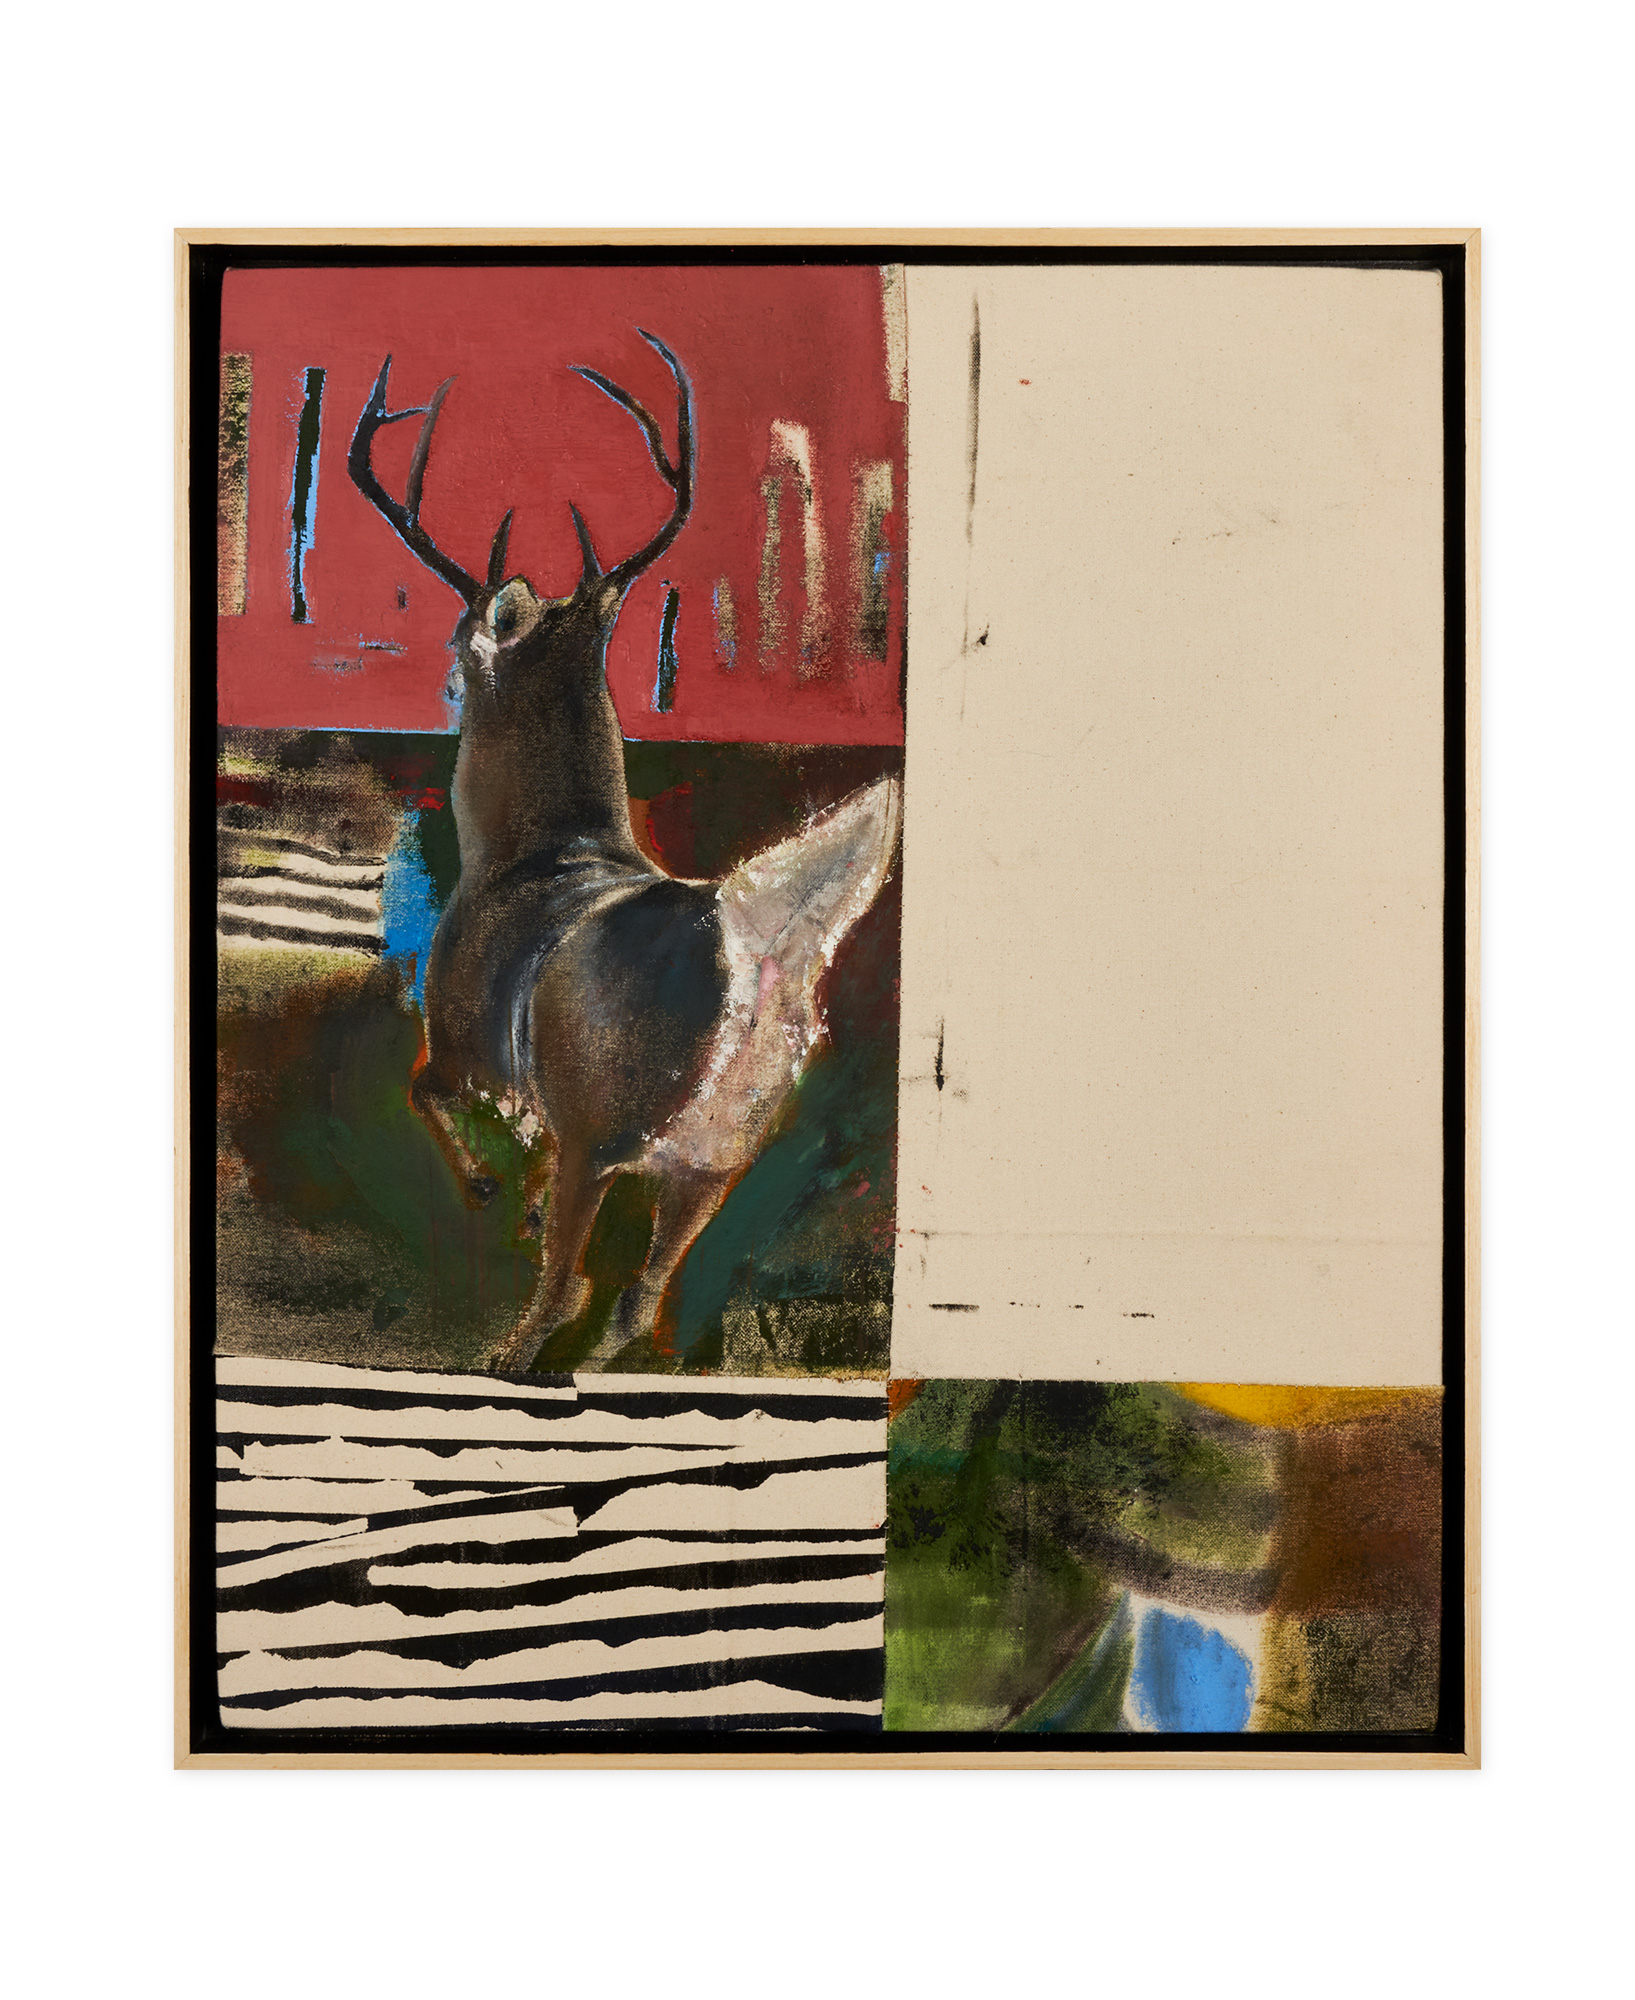 20190502_Santiago-Escobedo-Garcia_Paintings_P39_vertical_small-web.jpg